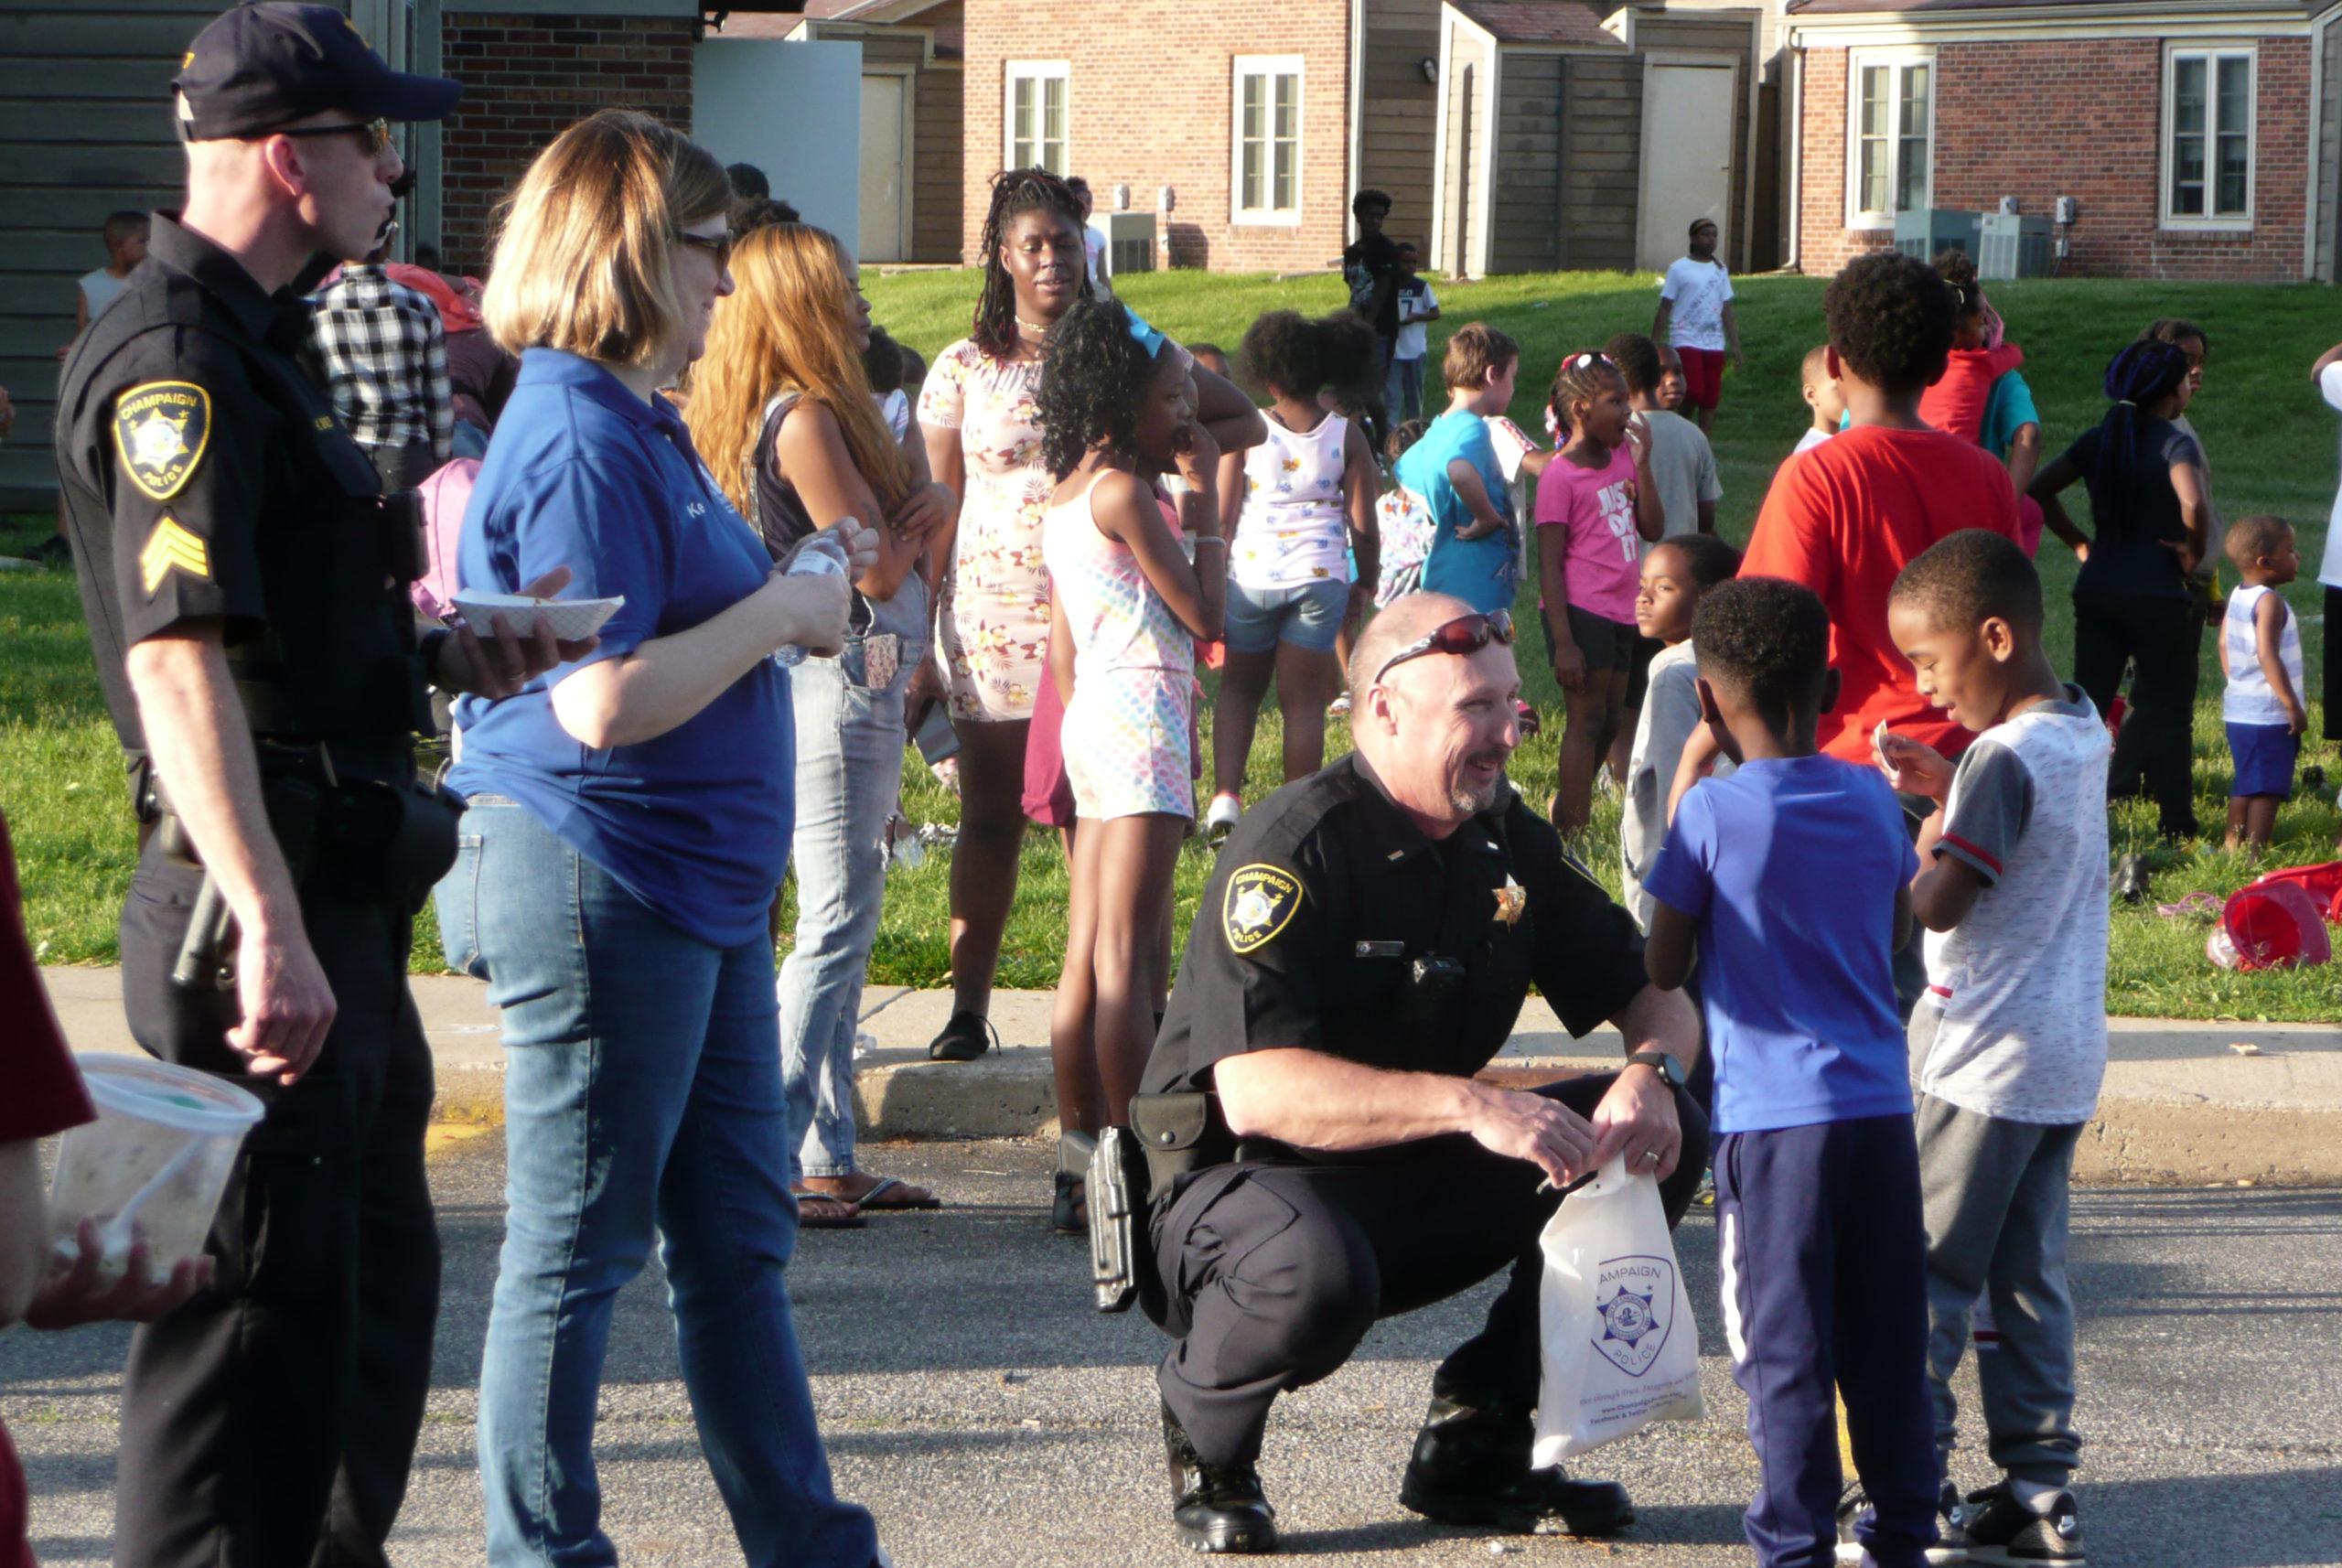 Police-community engagement